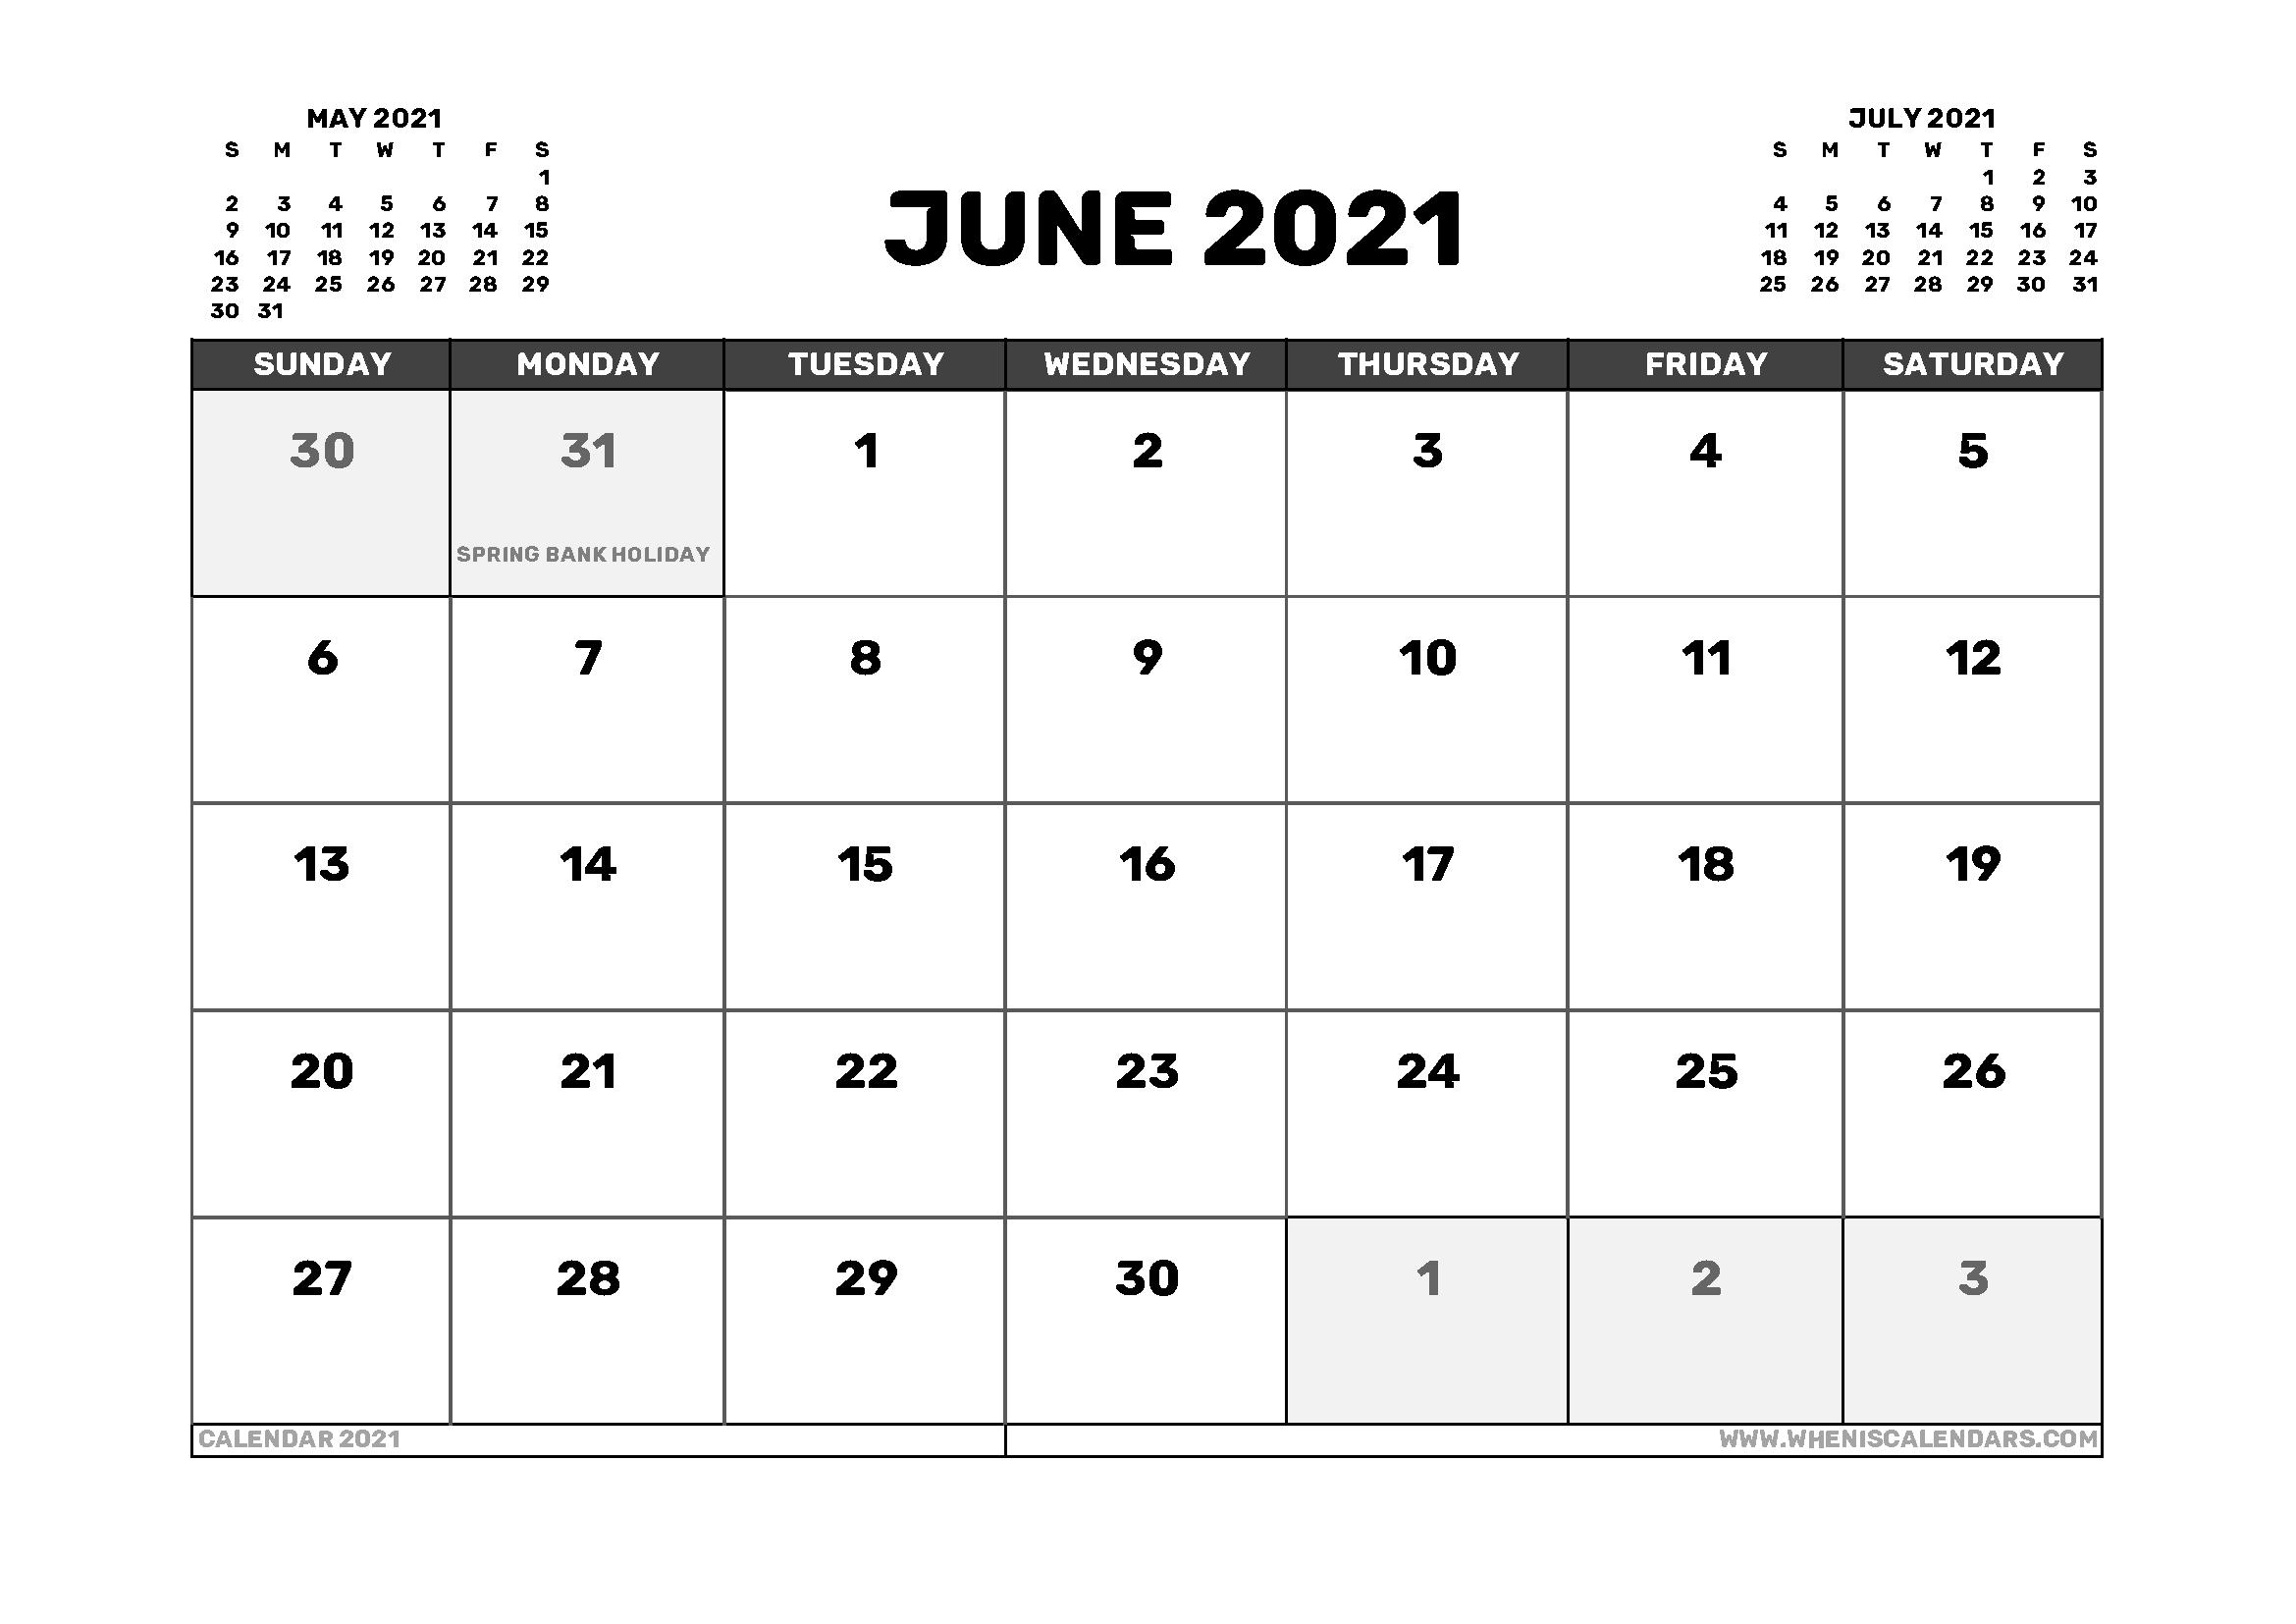 June 2021 Calendar Uk With Holidays June 2021 Calendar With Holidays Usa